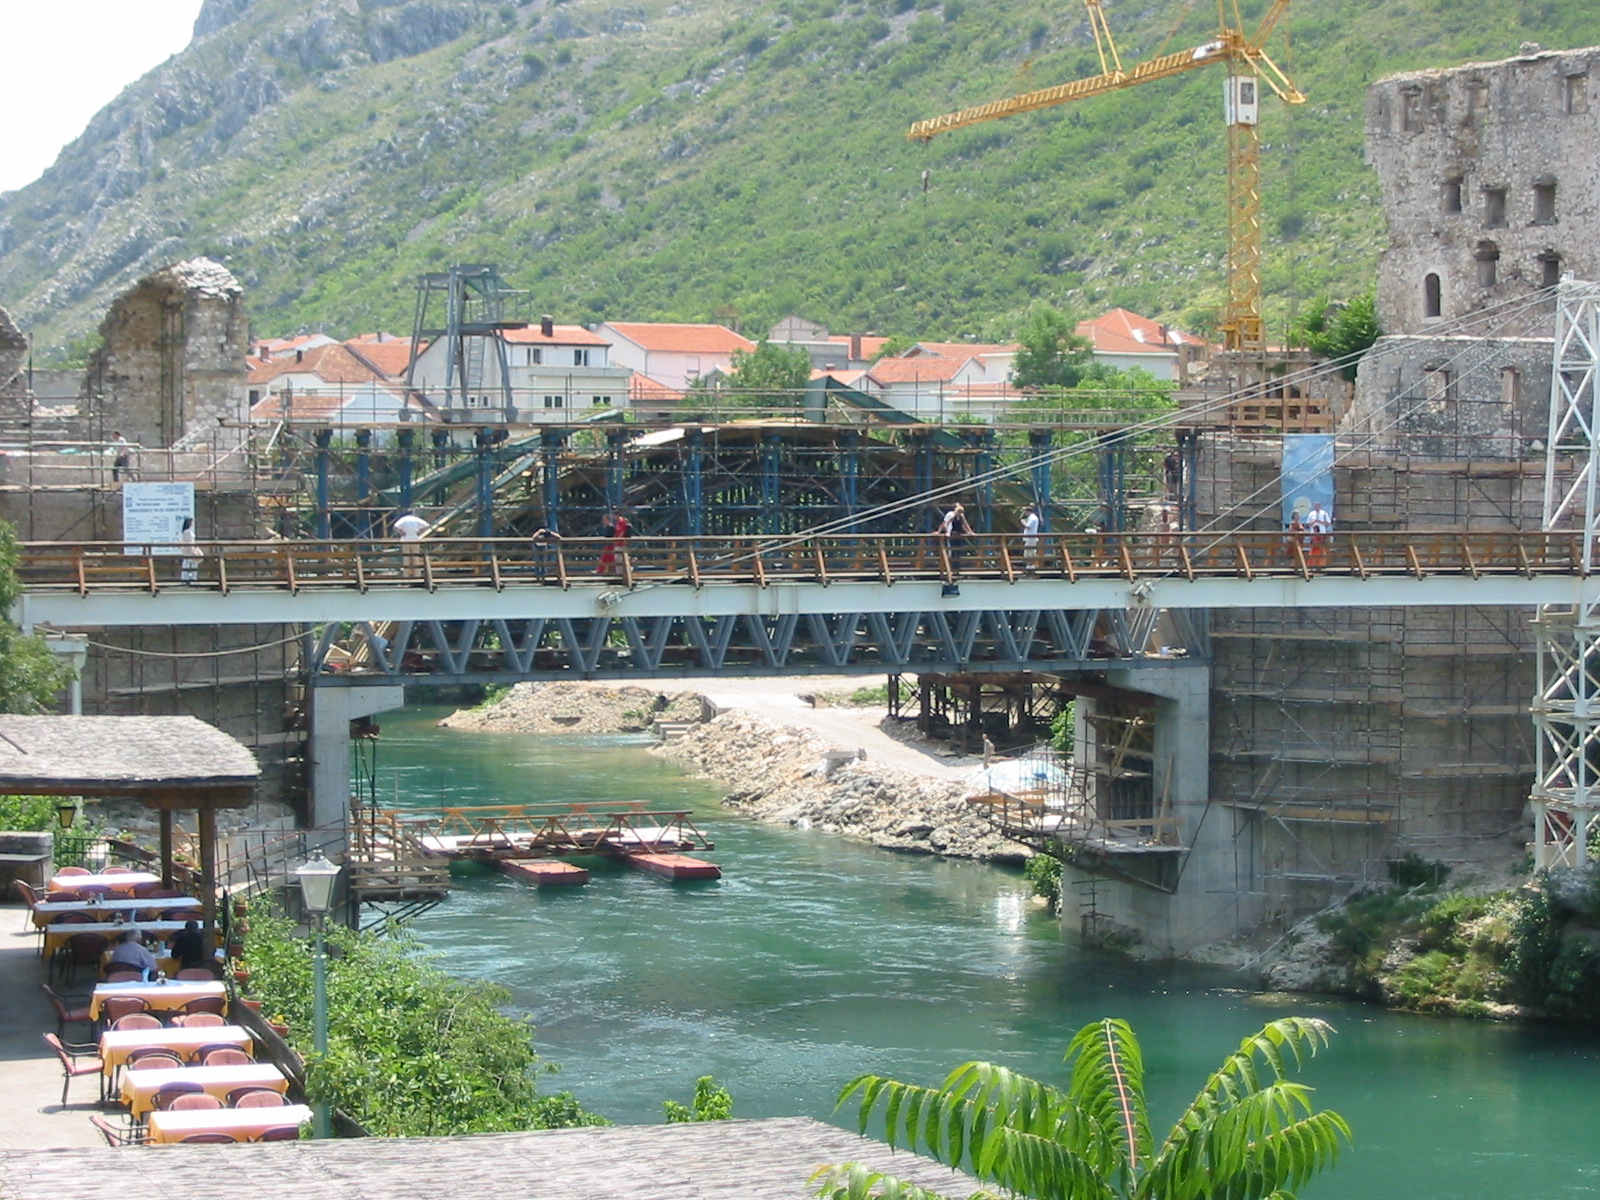 Mostar Bosnia  city photos gallery : Bosnia, Mostar, old bridge 2 Wikipedia, the free ...